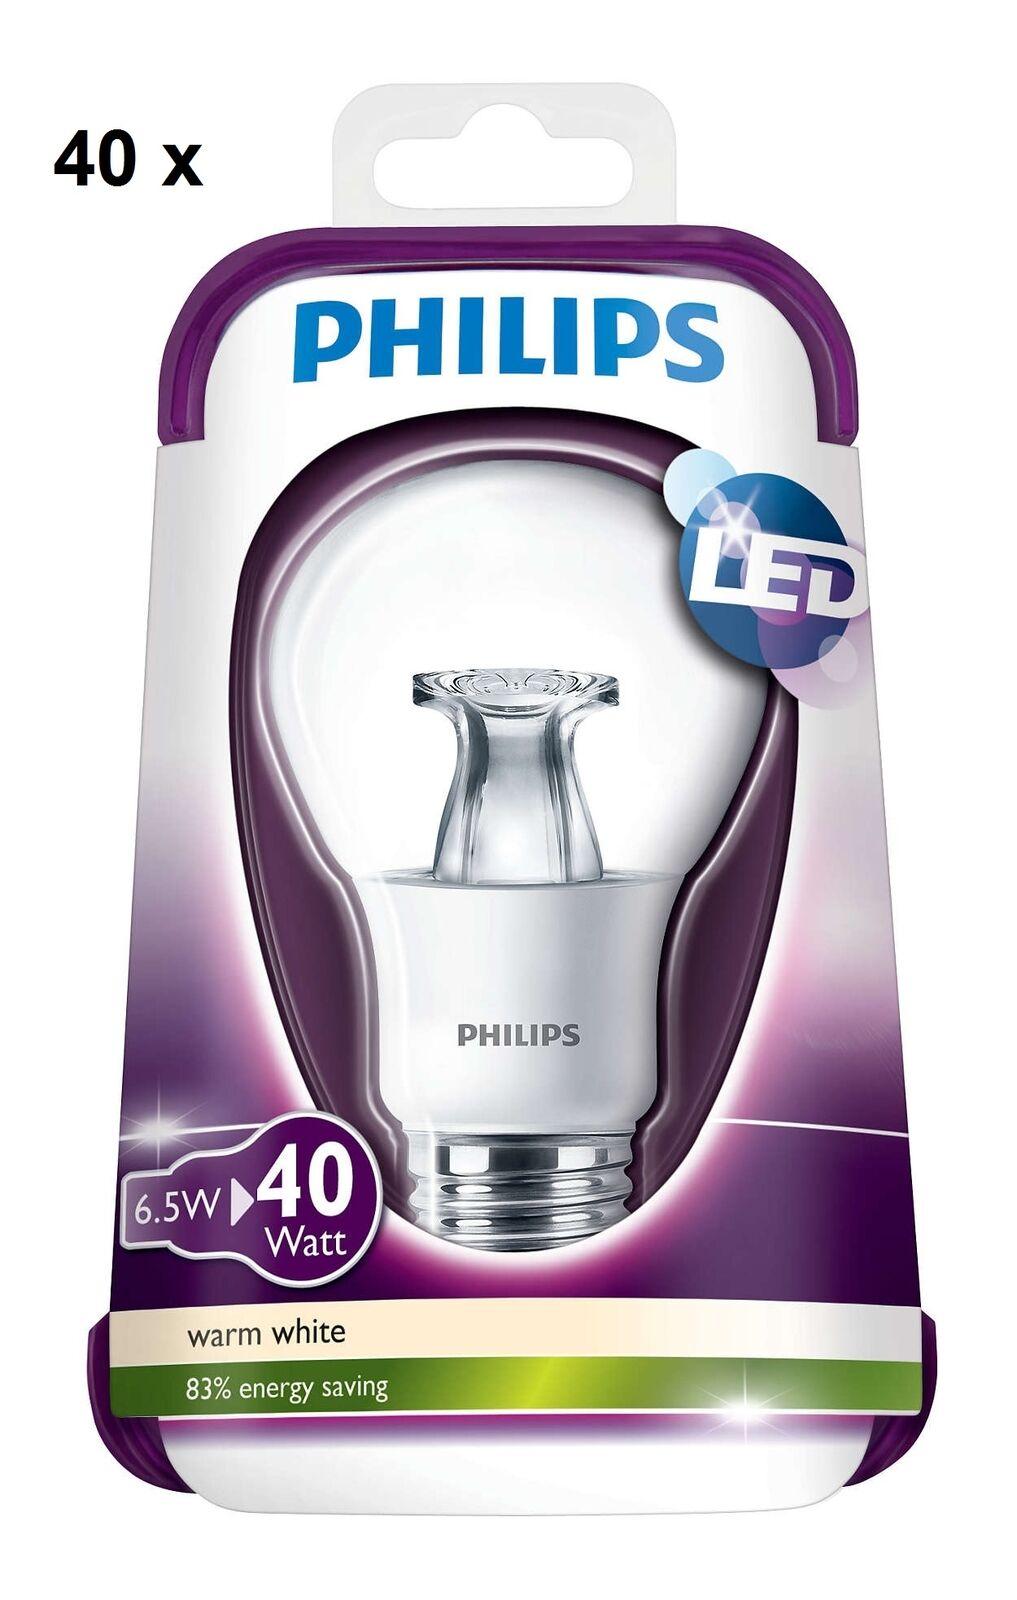 40x Philips LED 40W House Clear Bulb Lamp E27 Lumen 2700K 6.5 W Warm Weiß 470lm